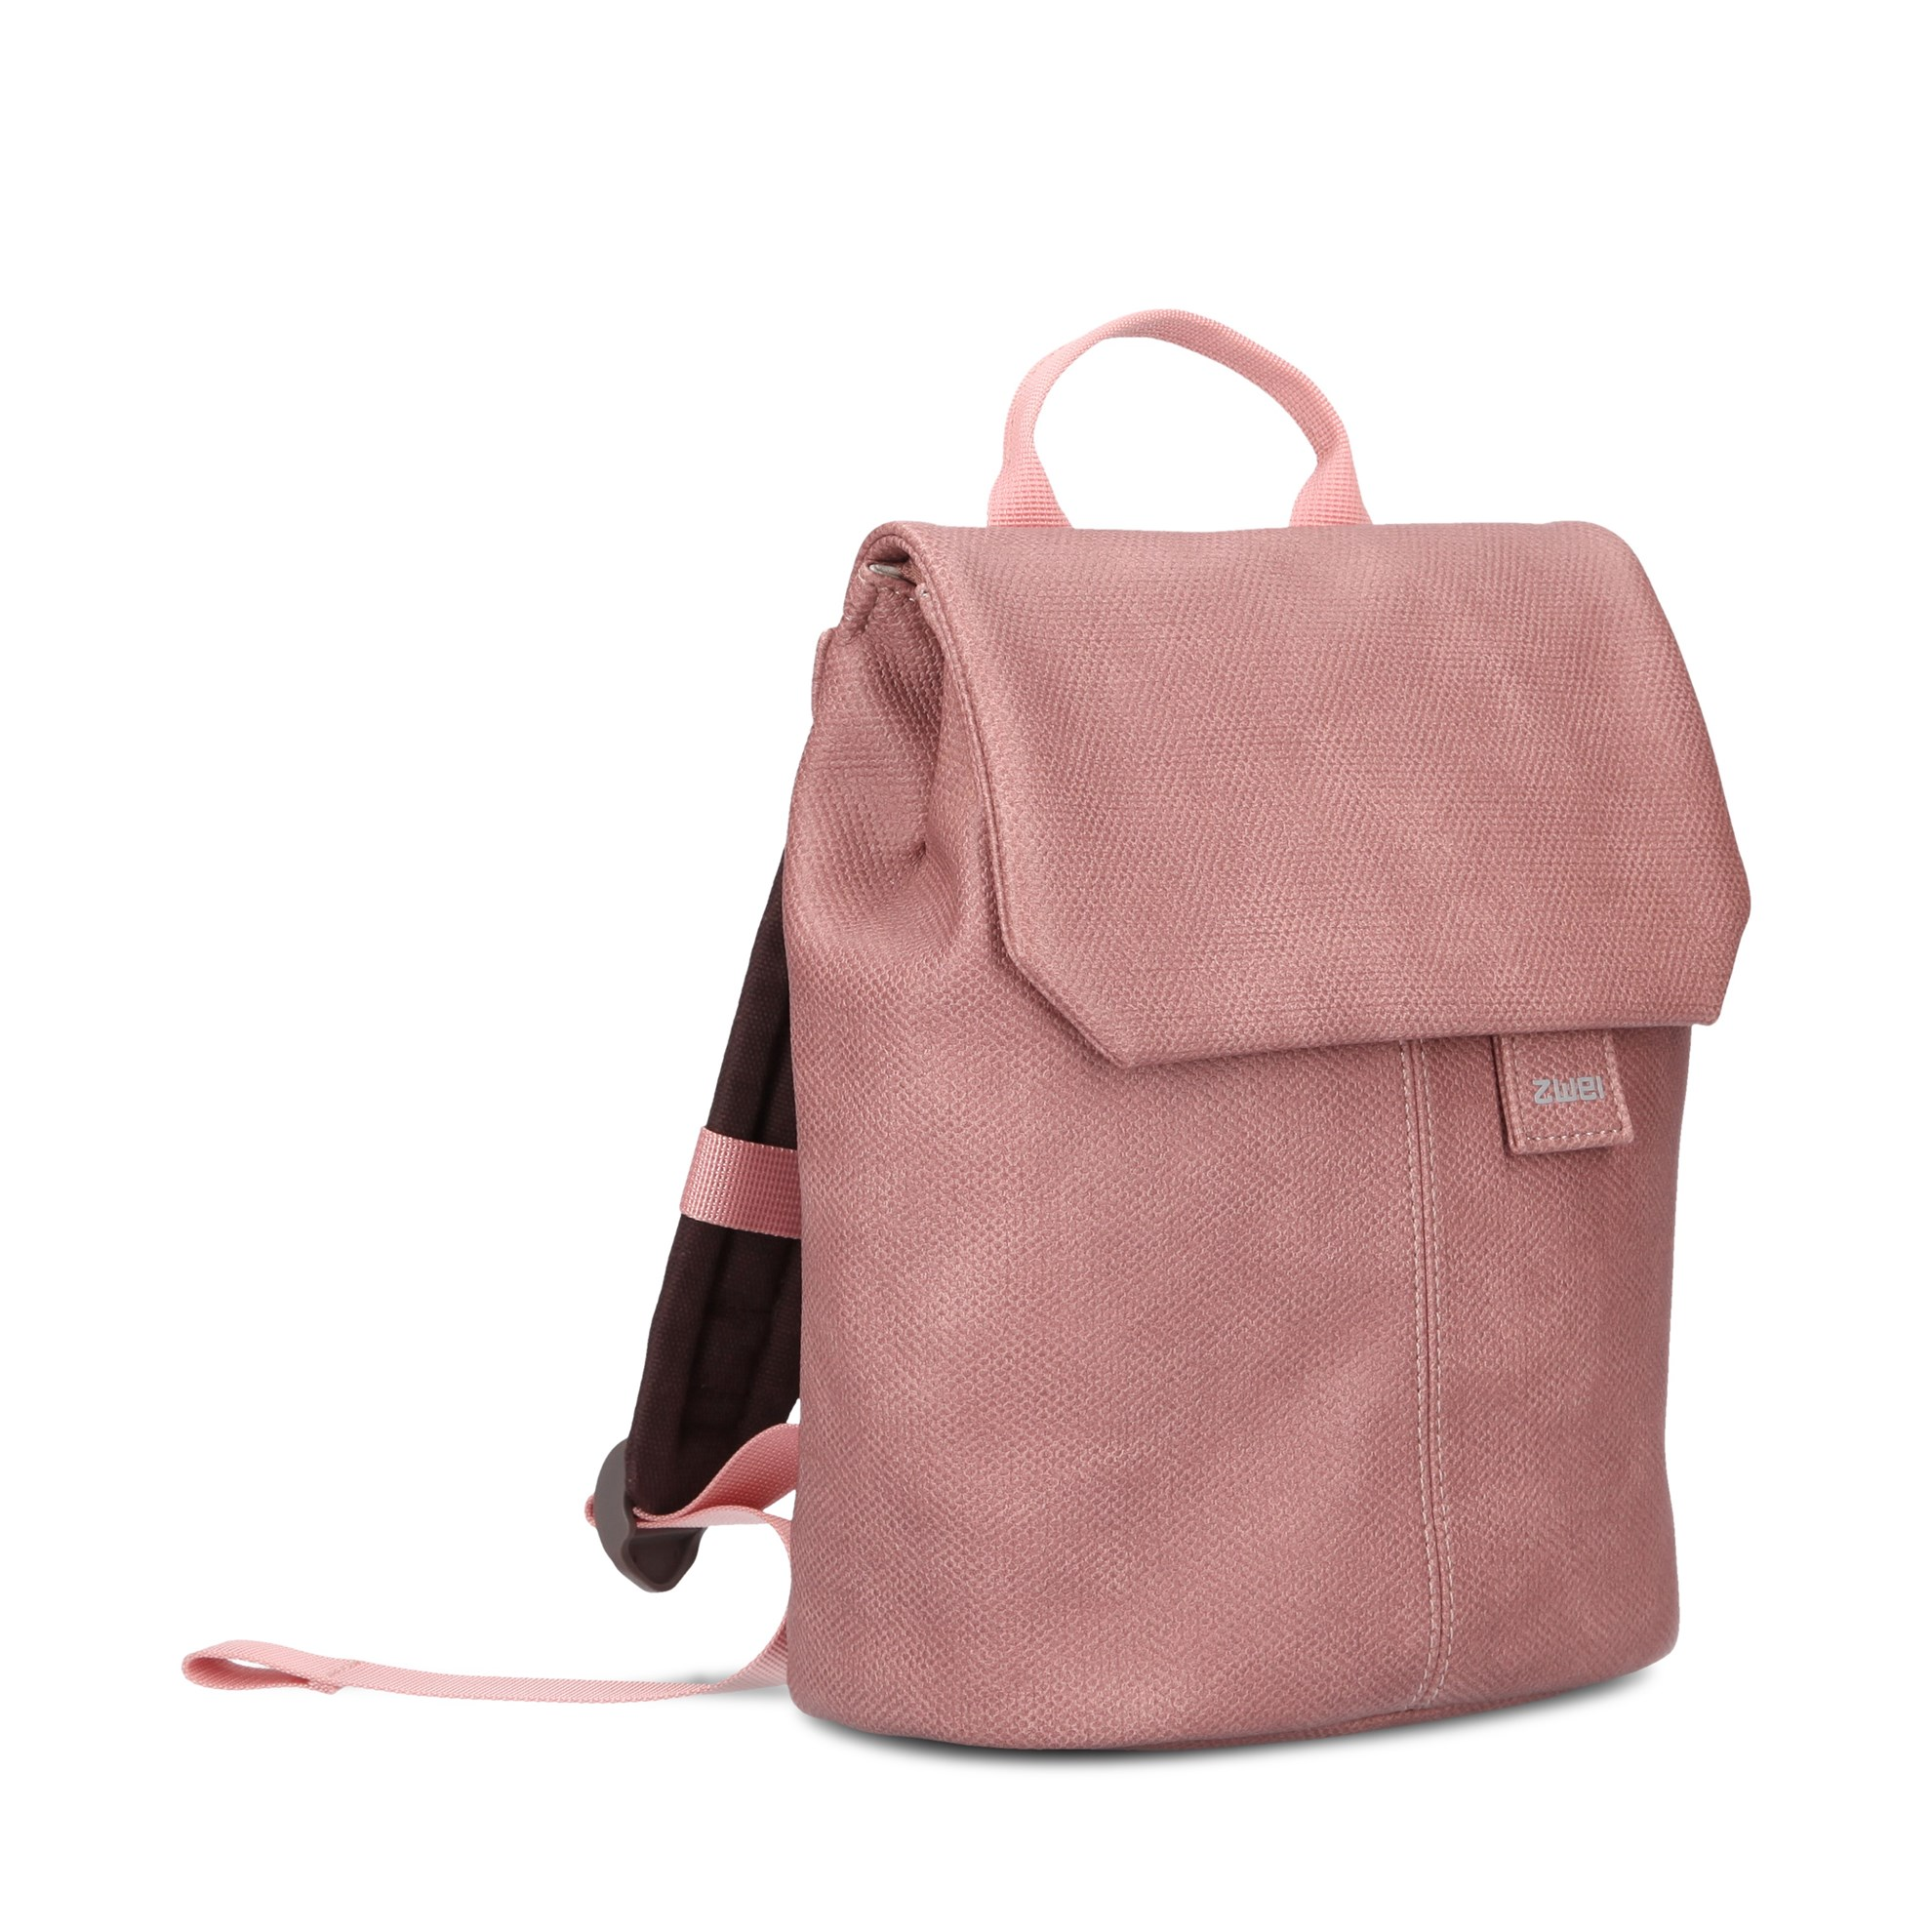 Dětský batoh ZWEI MADEMOISELLE MKR30_1